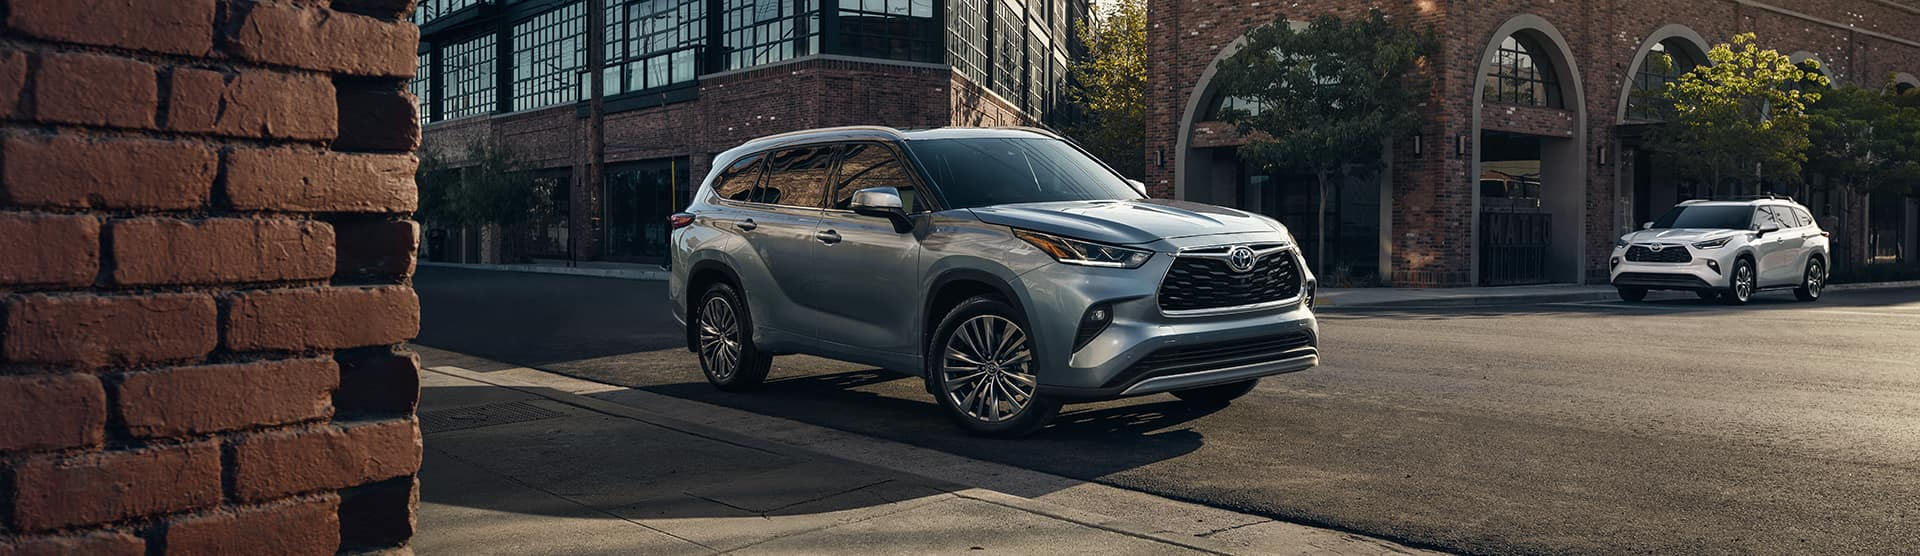 Halterman's Toyota is a Toyota Dealership near Scranton, PA | 2021 Toyota Highlander driving on city street